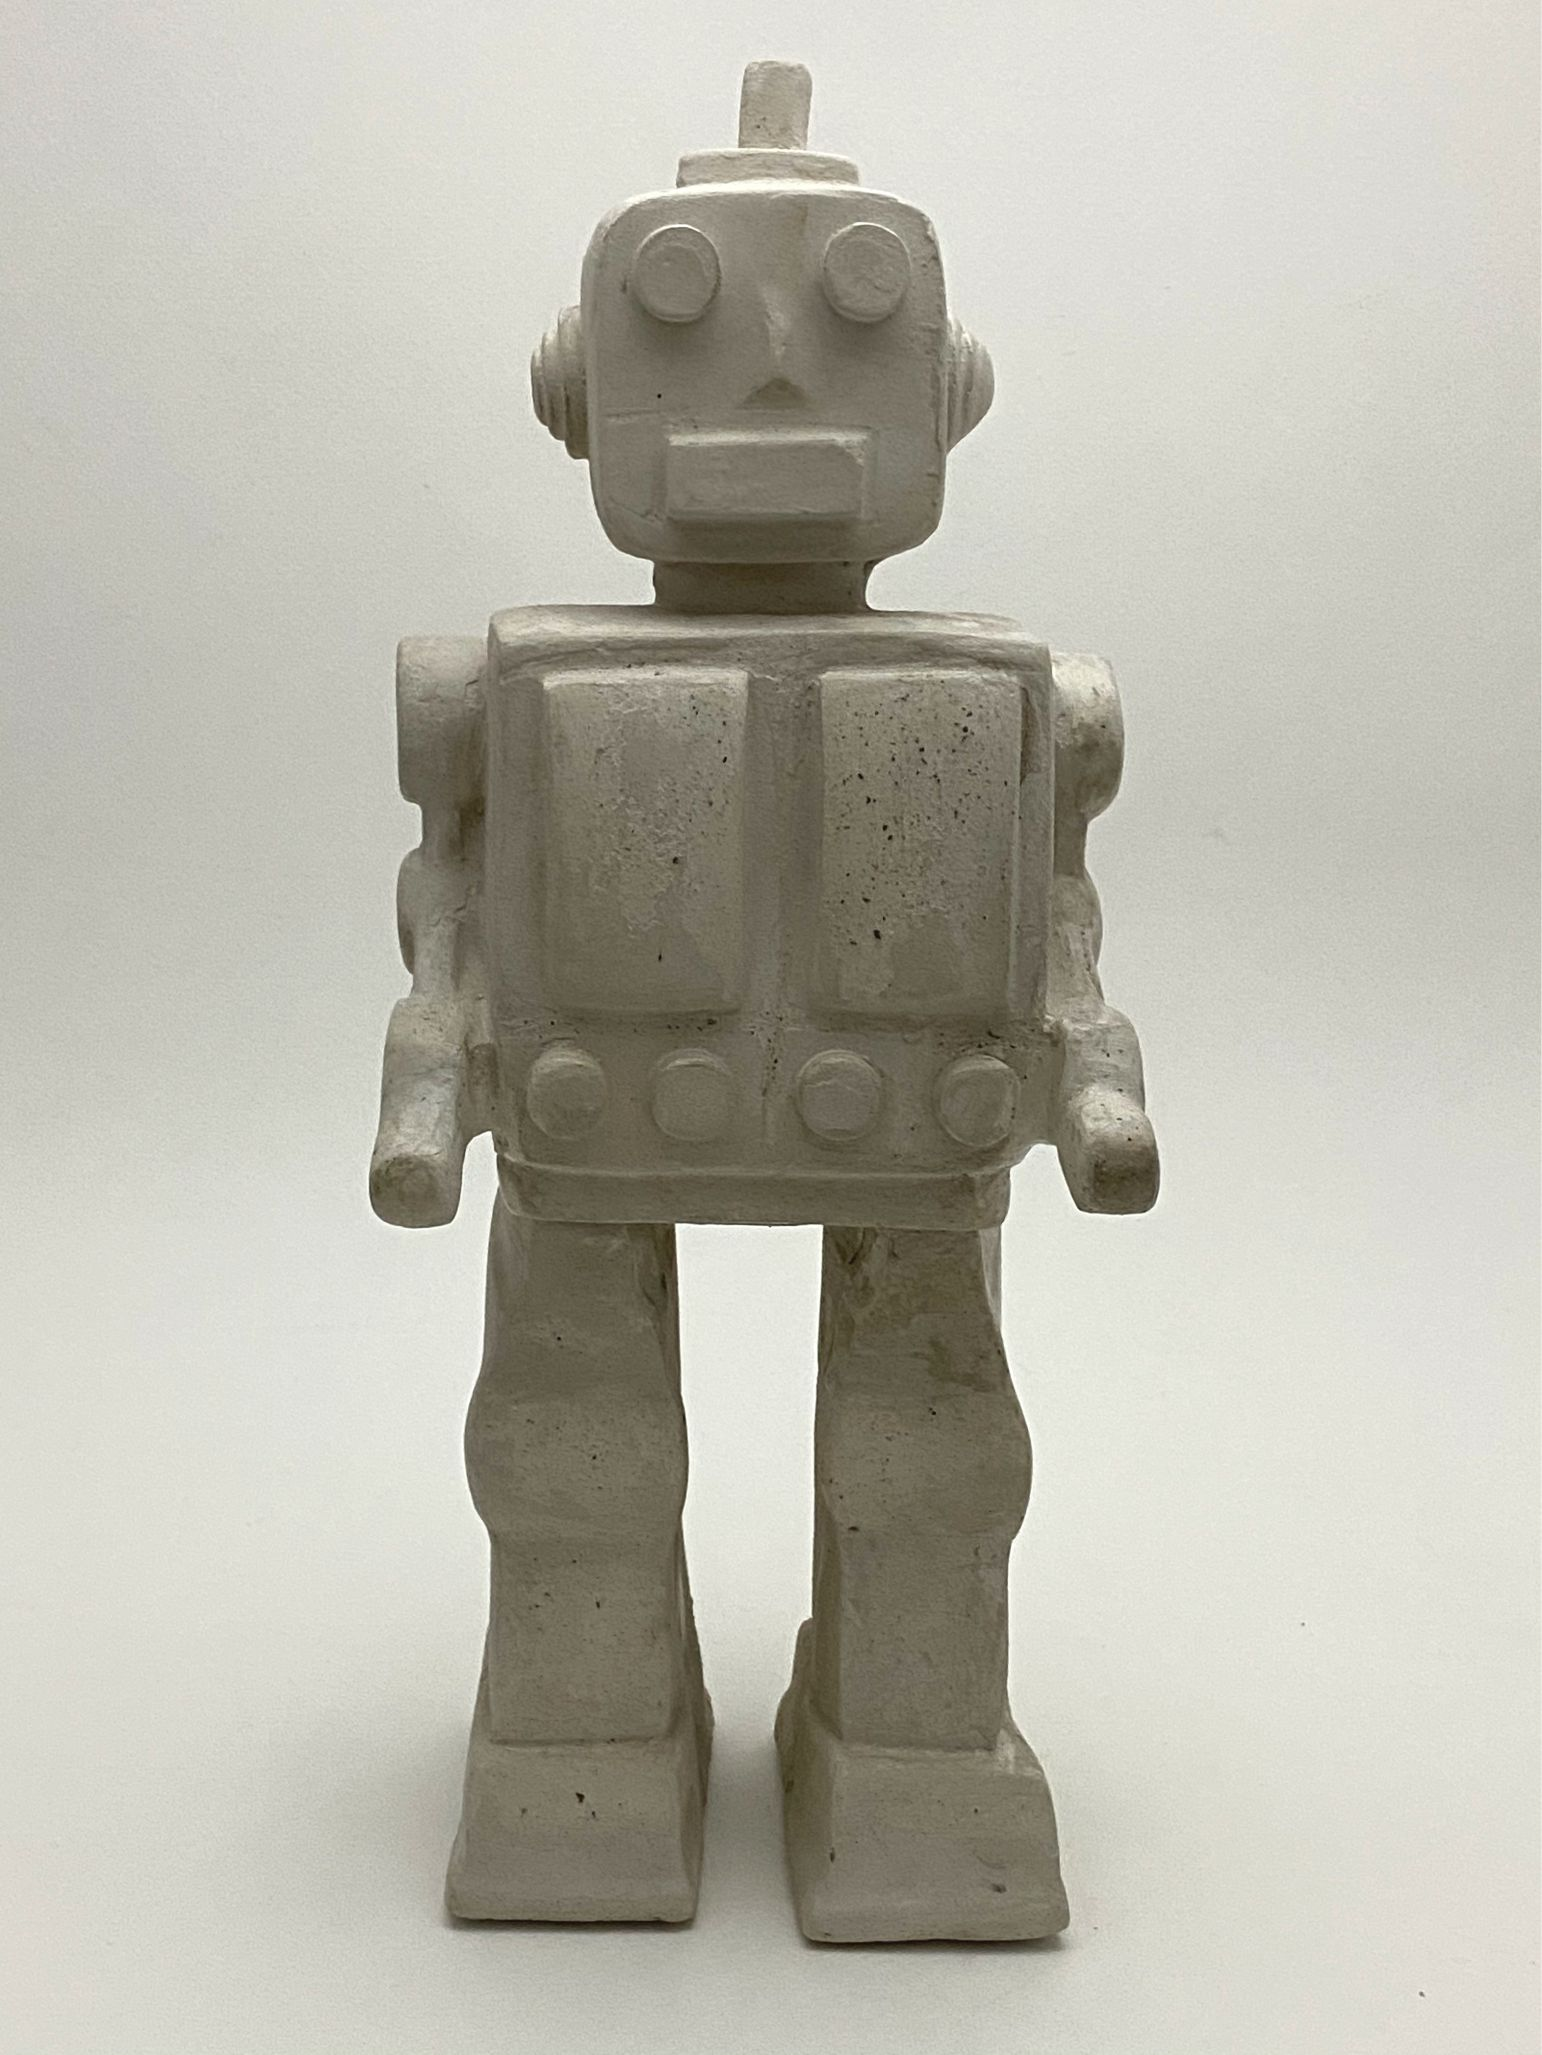 Robot_cemento_L725 frente